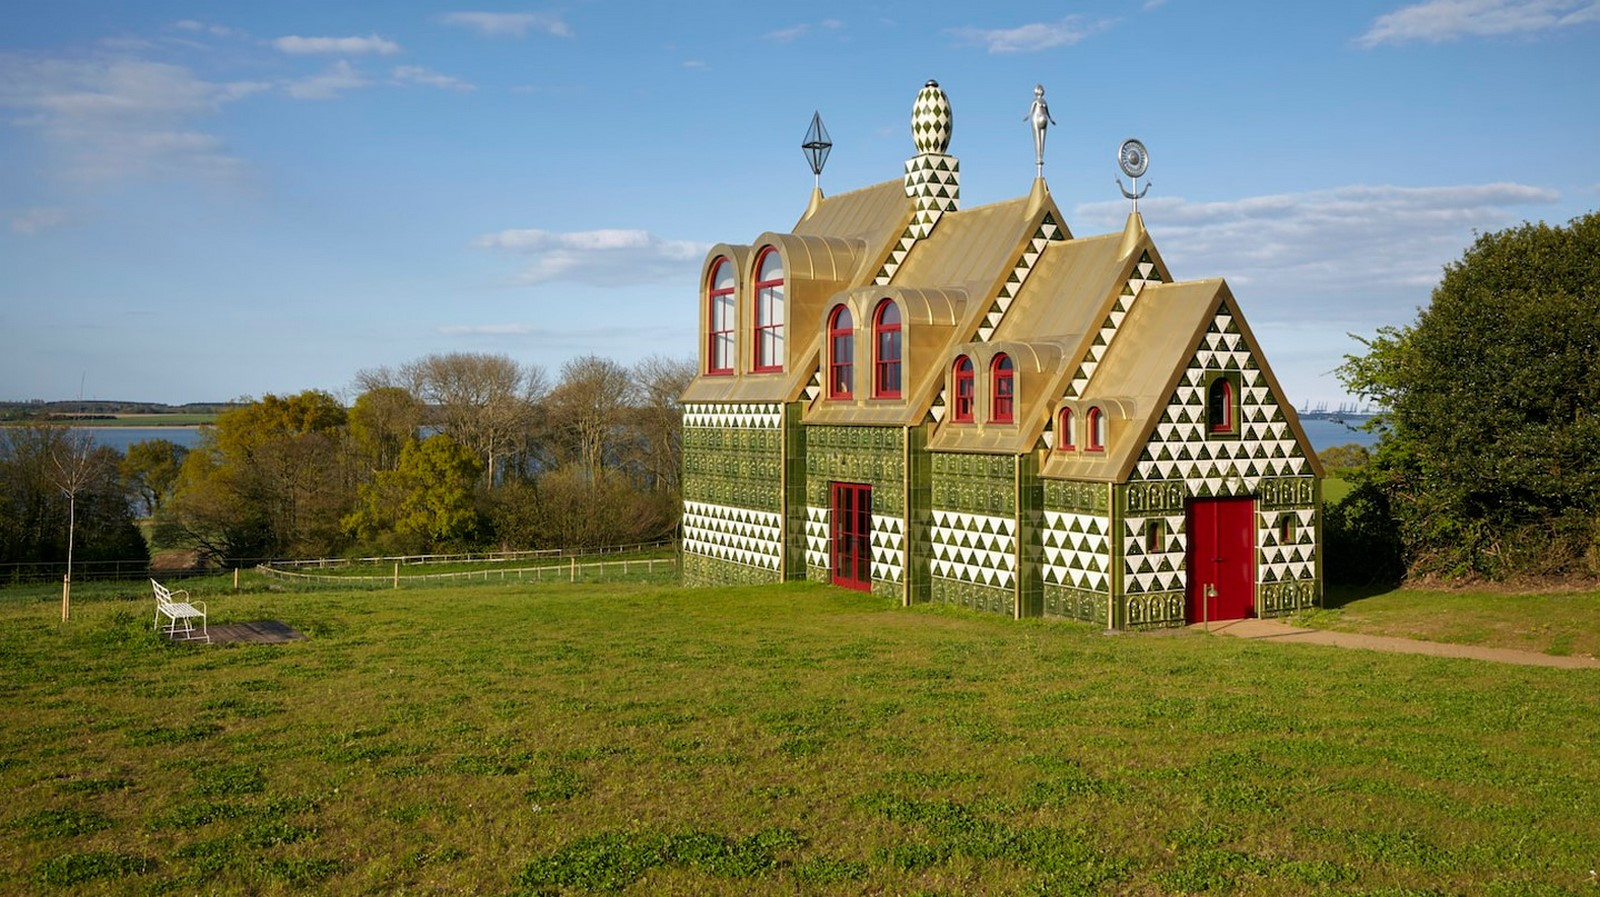 A House for Essex, Wrabness, United Kingdom - Sheet1